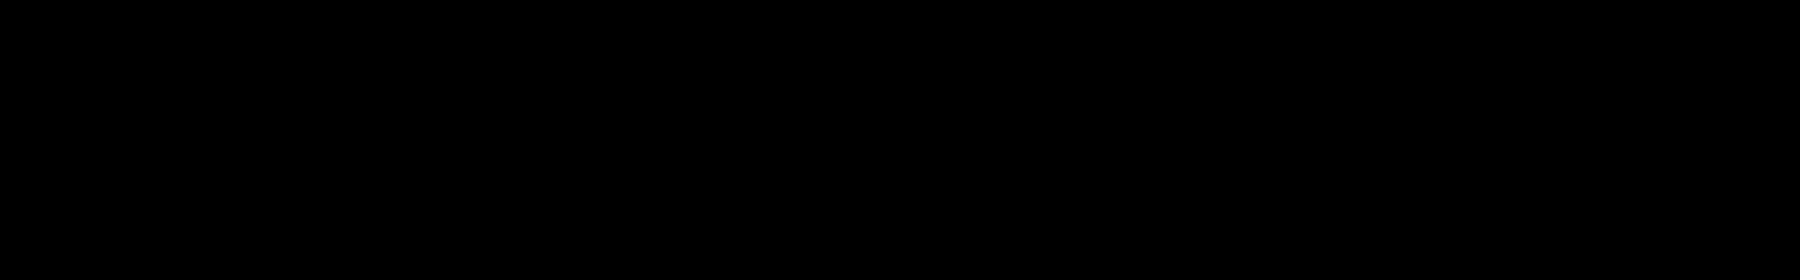 Ableton Melodic Progressive Trance audio waveform